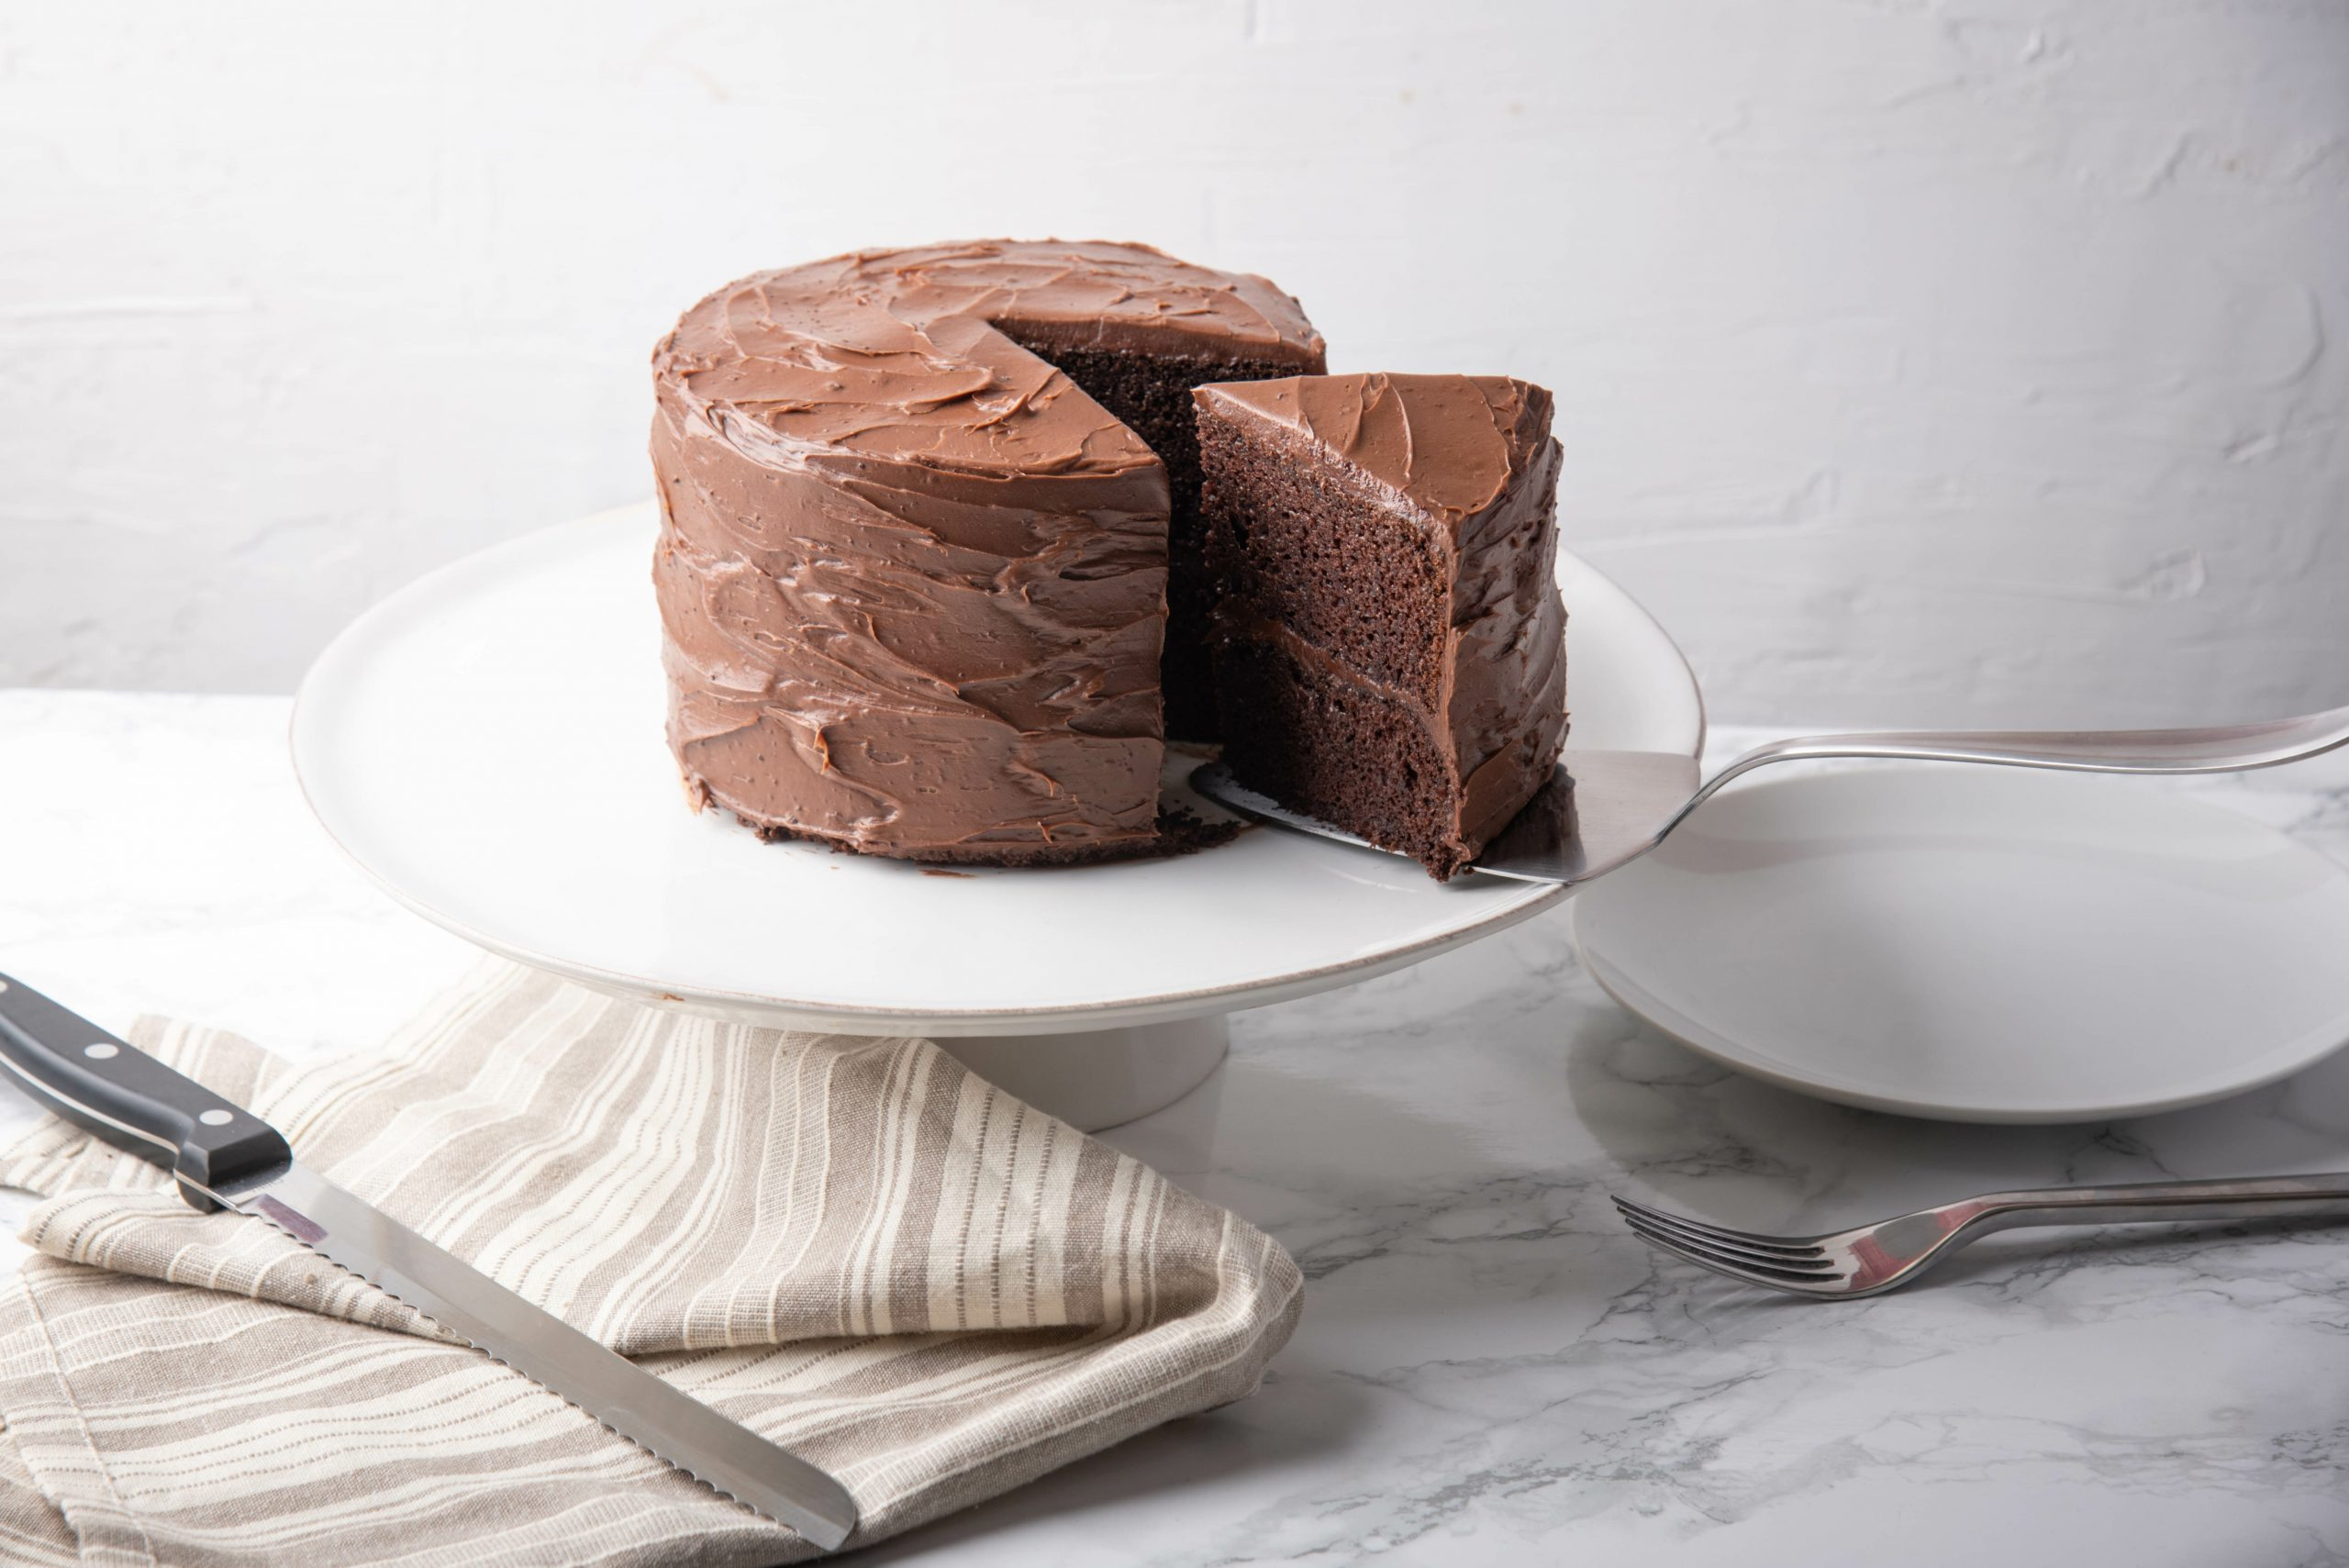 meilleur-gateau-au chocolat-wooloo_entete